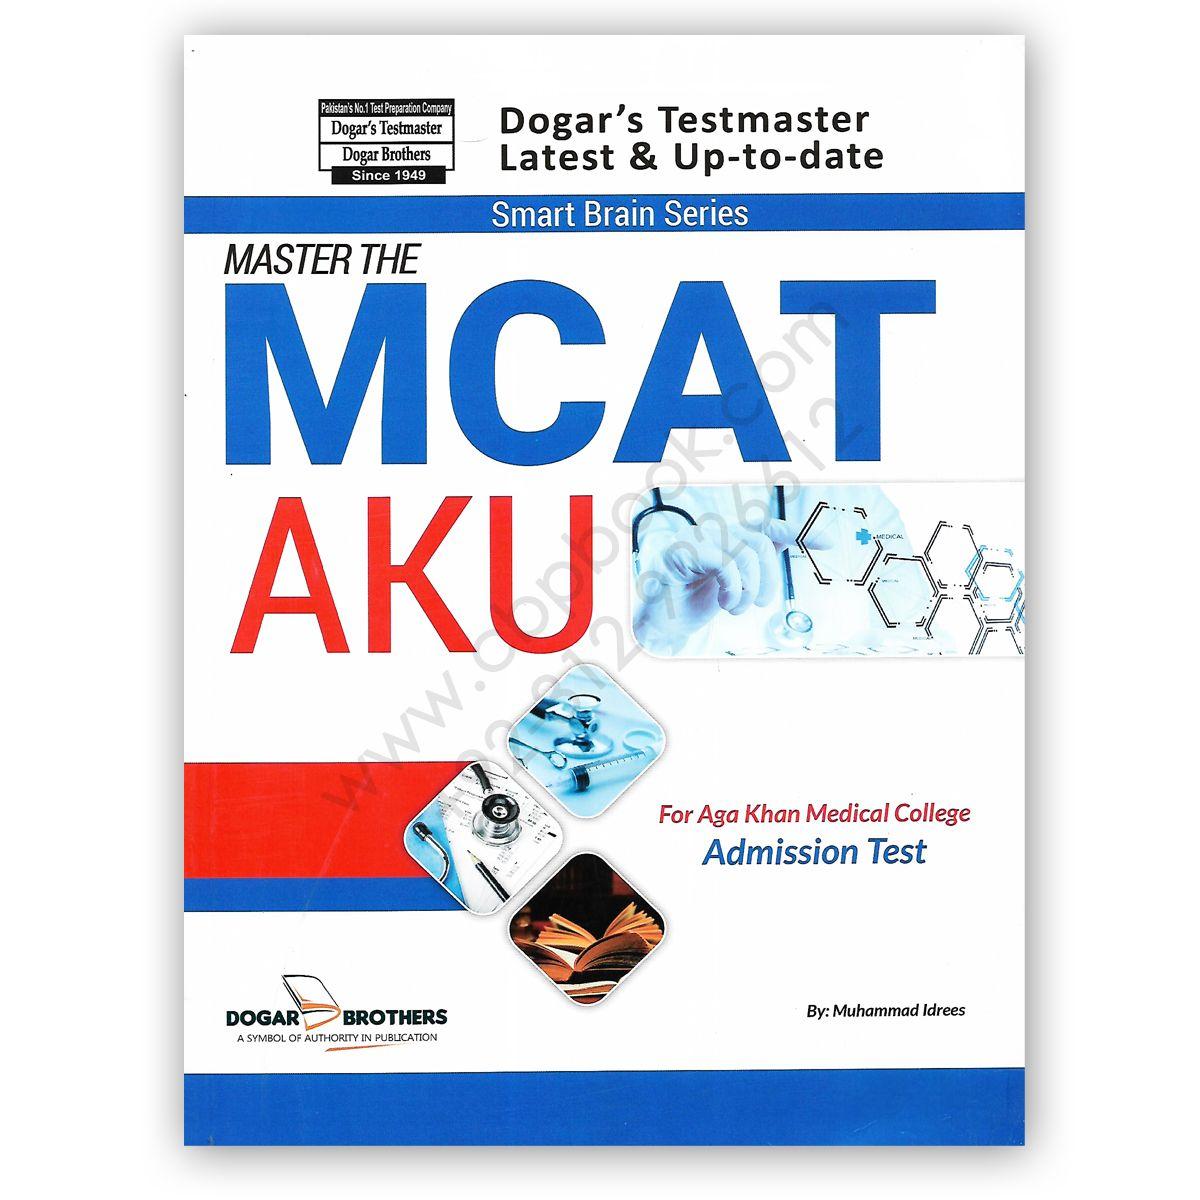 78d990c0c61ac7ff029030527dfe639f - How To Get Admission In Aga Khan Medical College